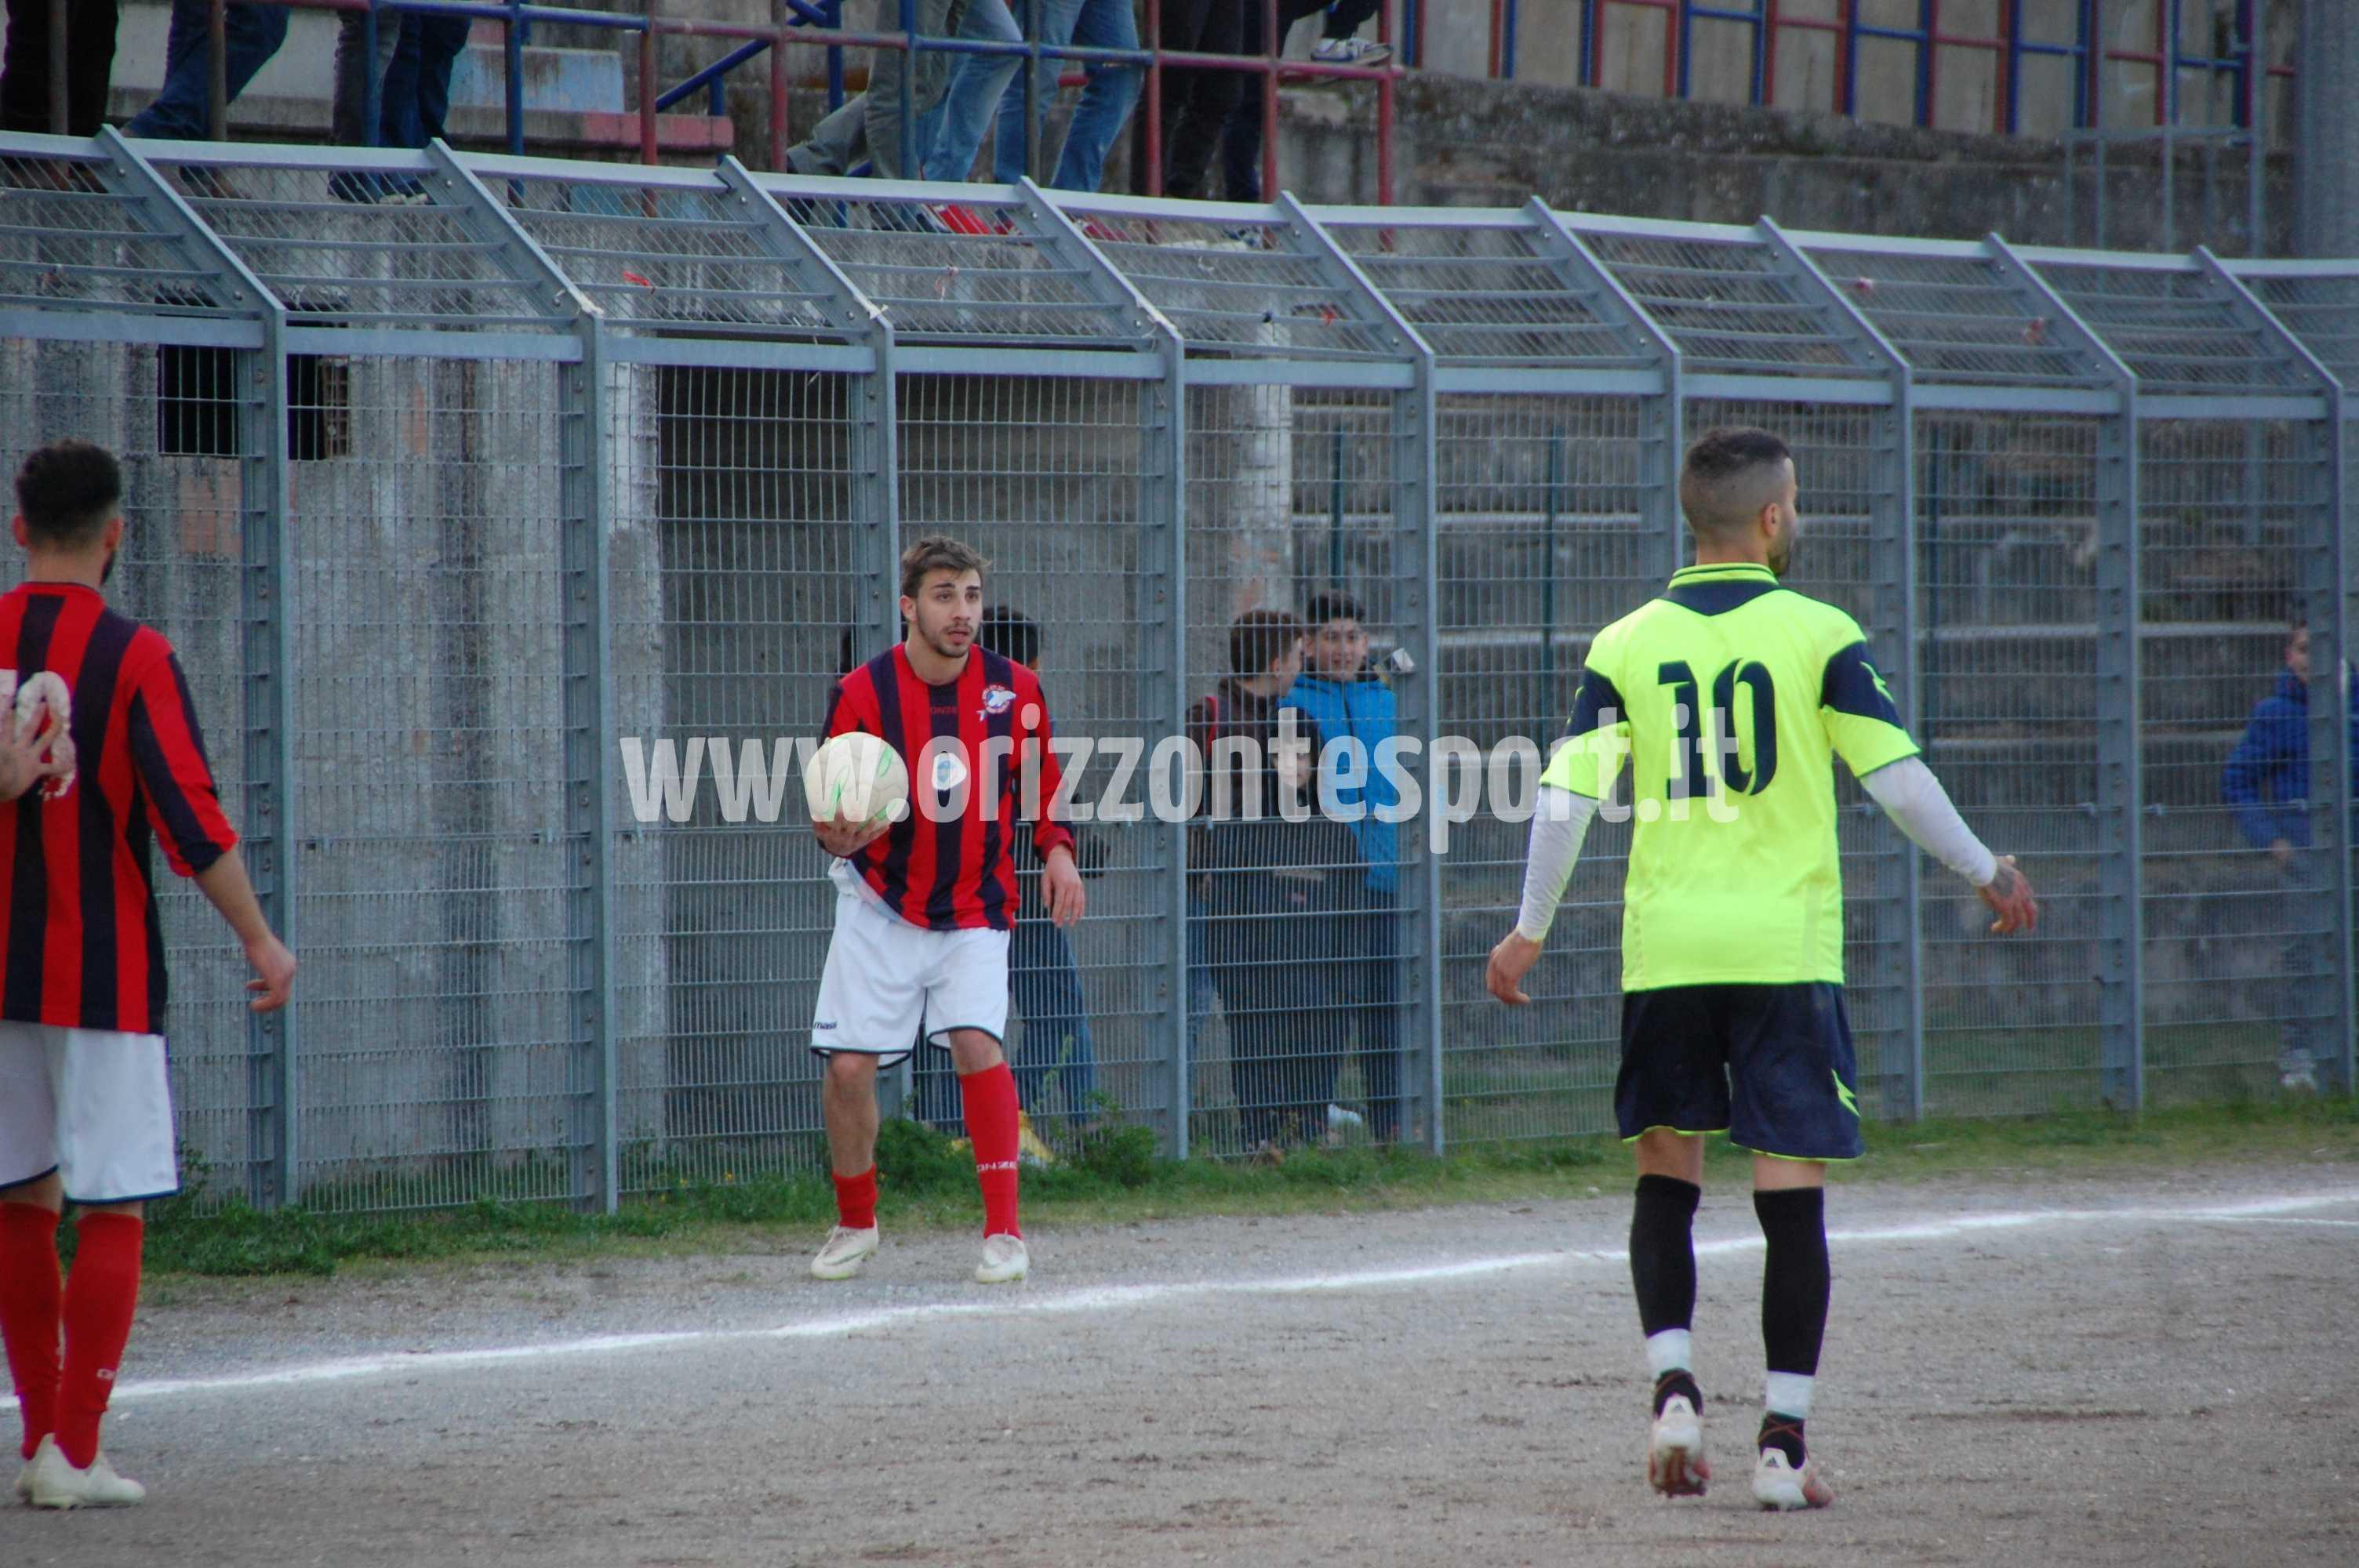 gnettimorano_praiatortora (114)